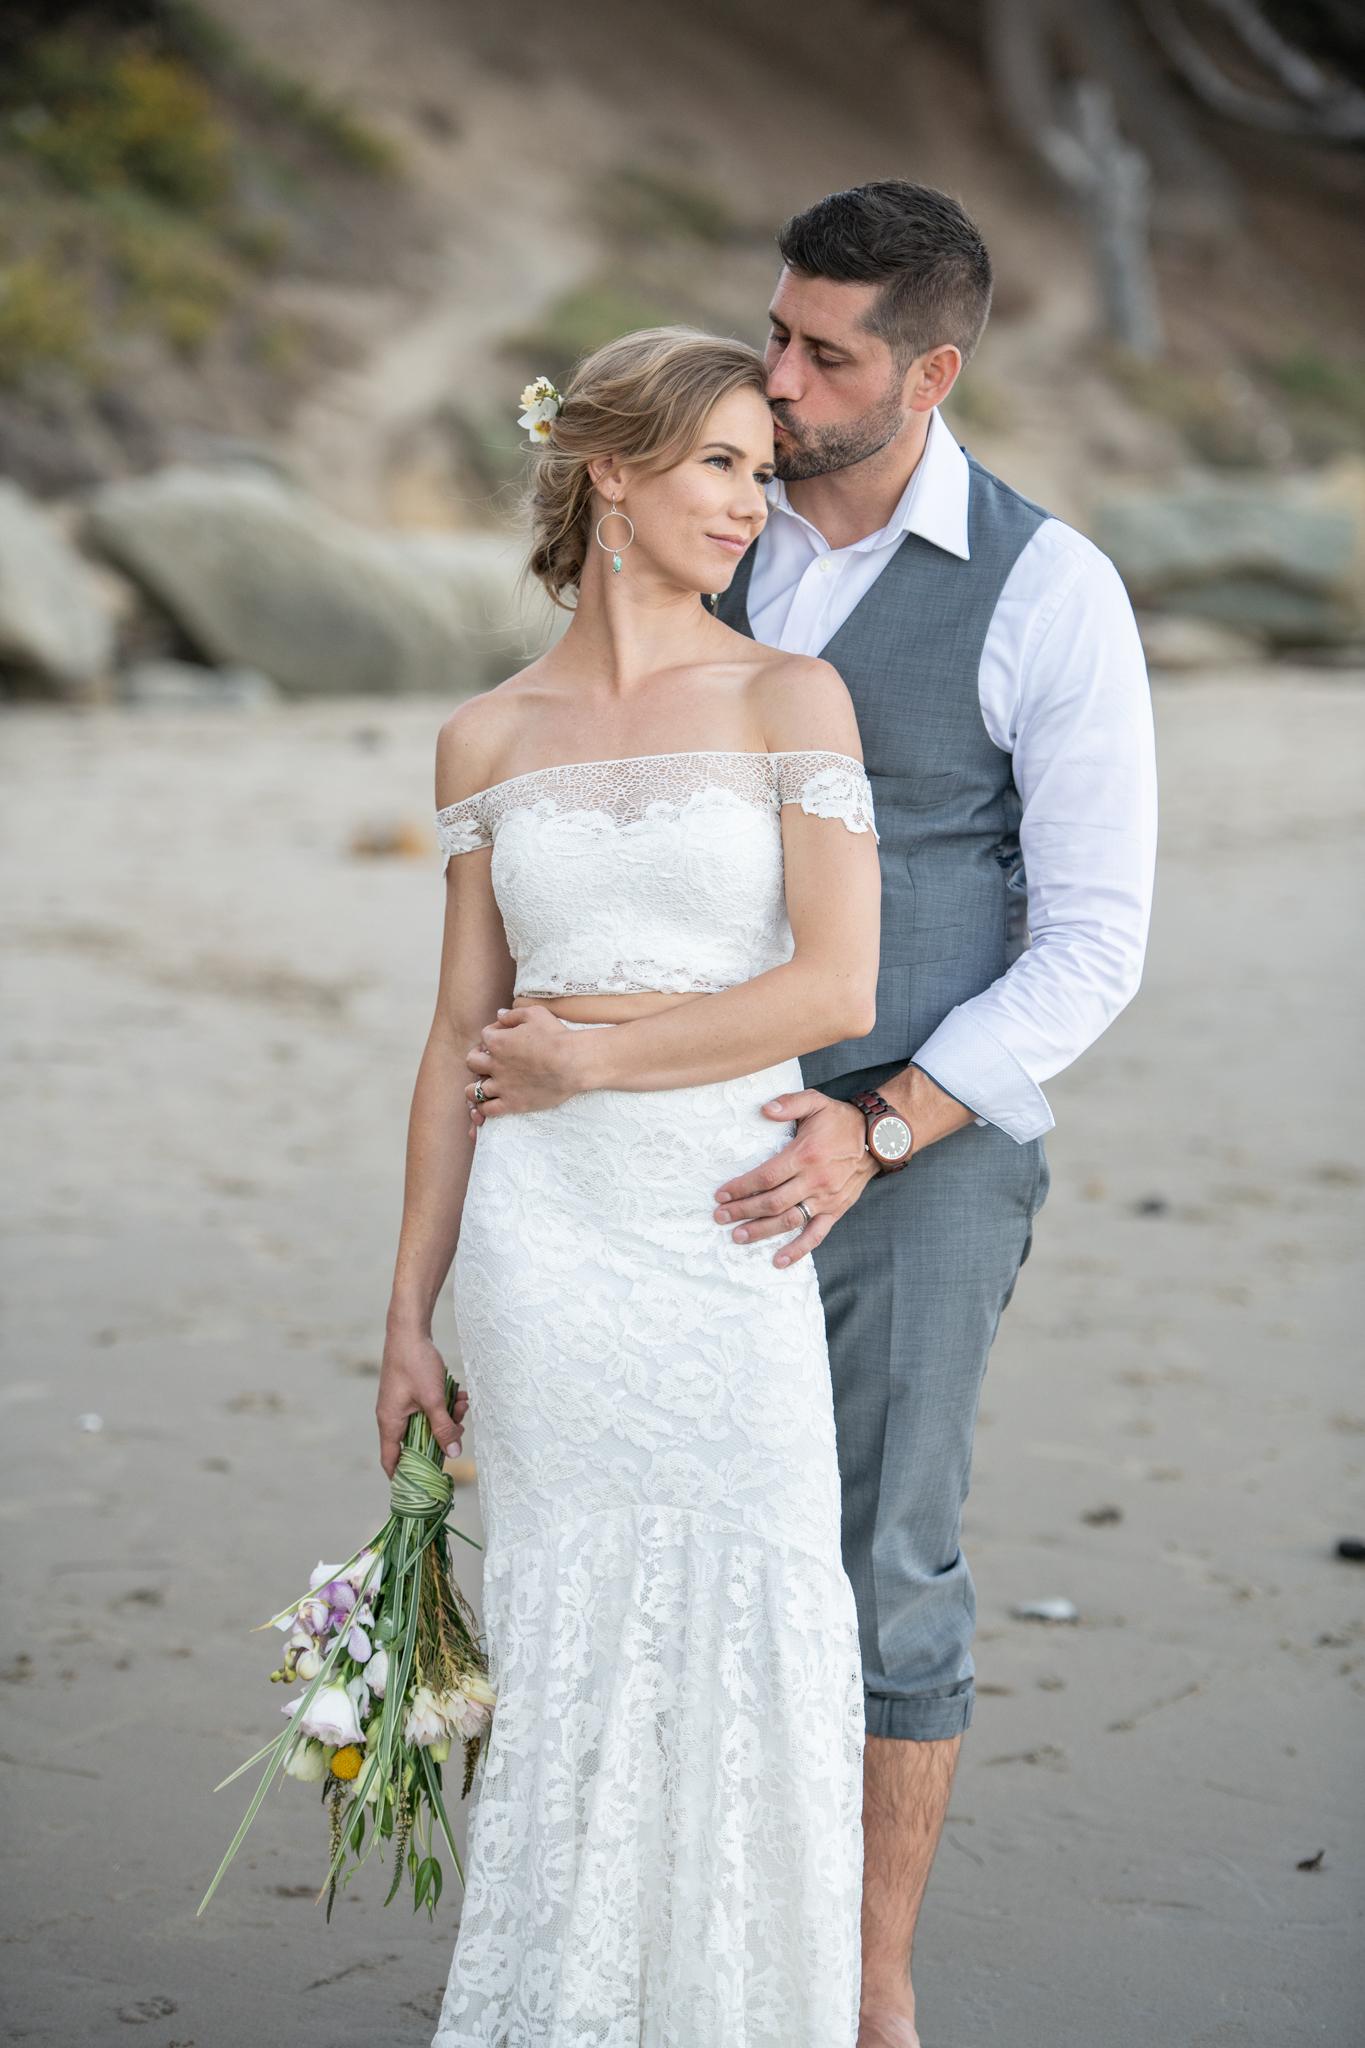 78_PRVW_Jenny_Ken_Wedding_Trevor_Hooper_Photo.jpg